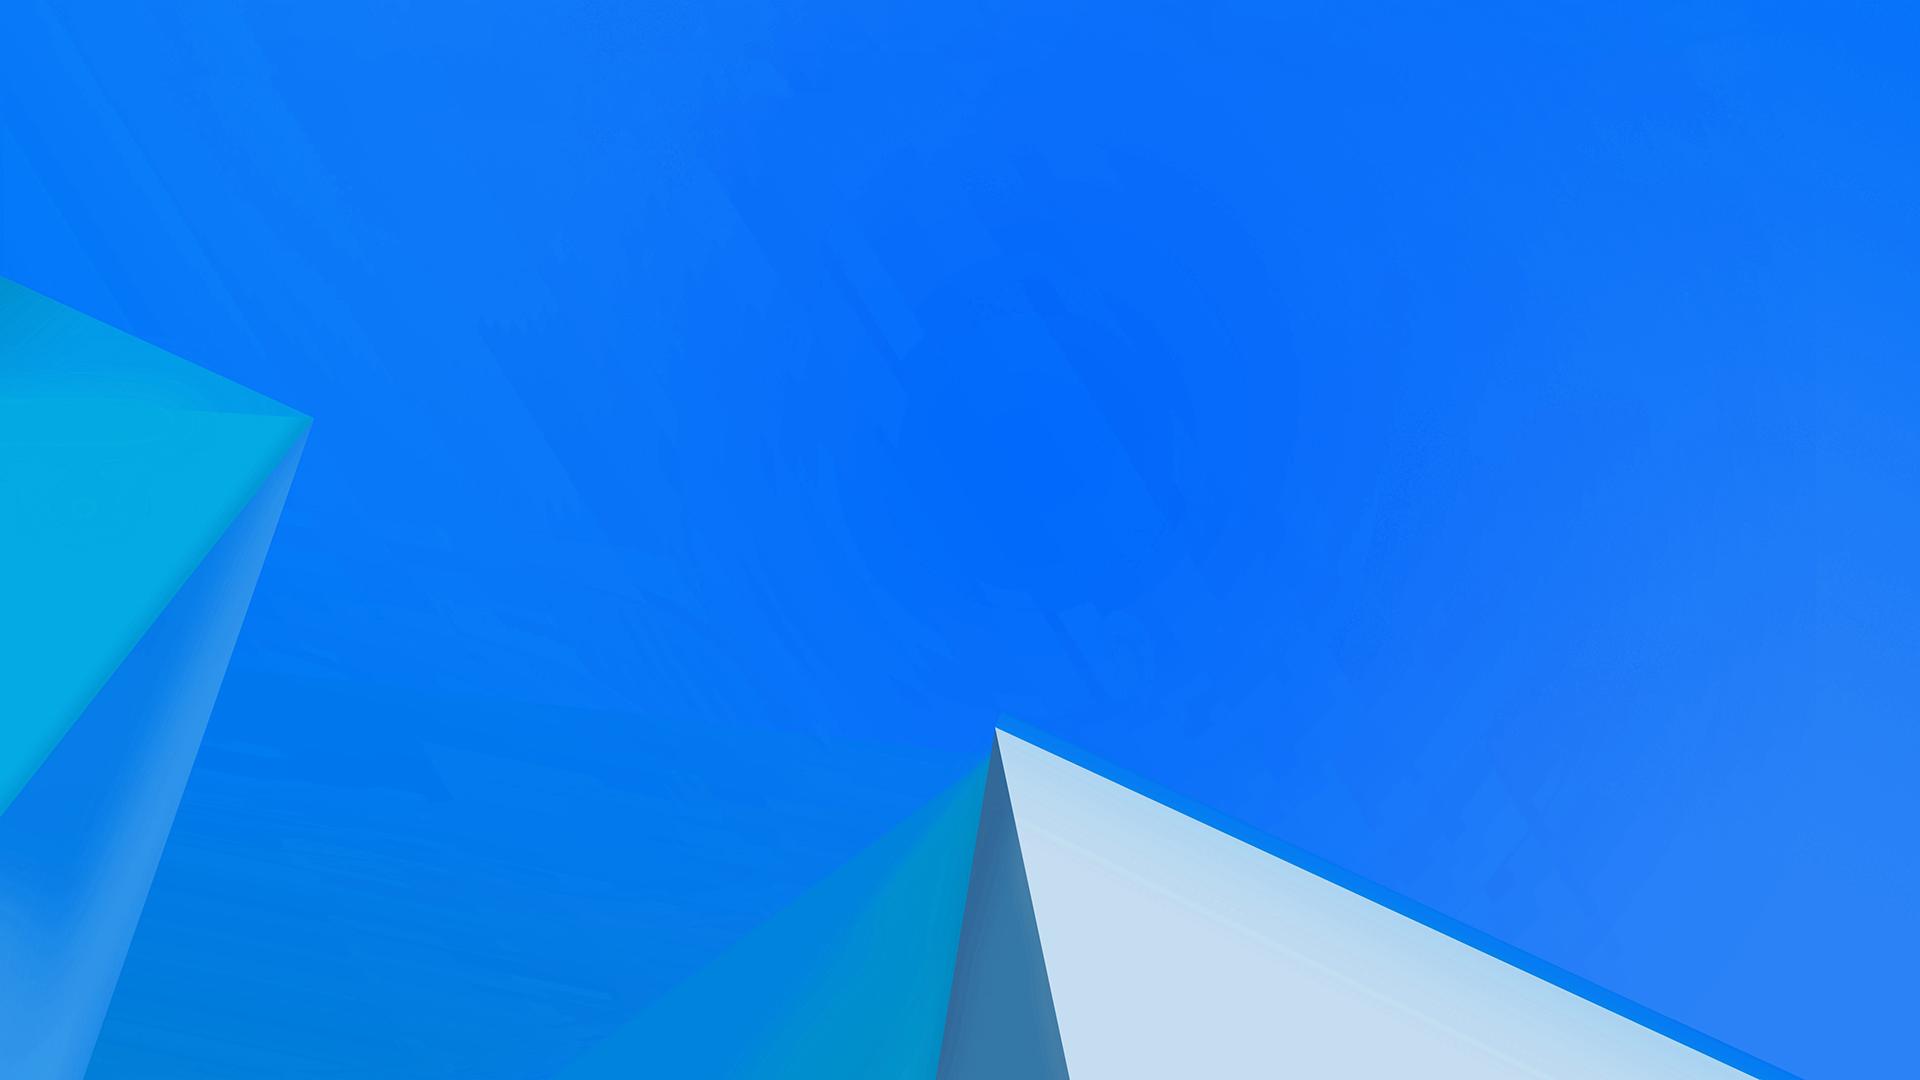 40 Windows 81 Blue Wallpaper On Wallpapersafari